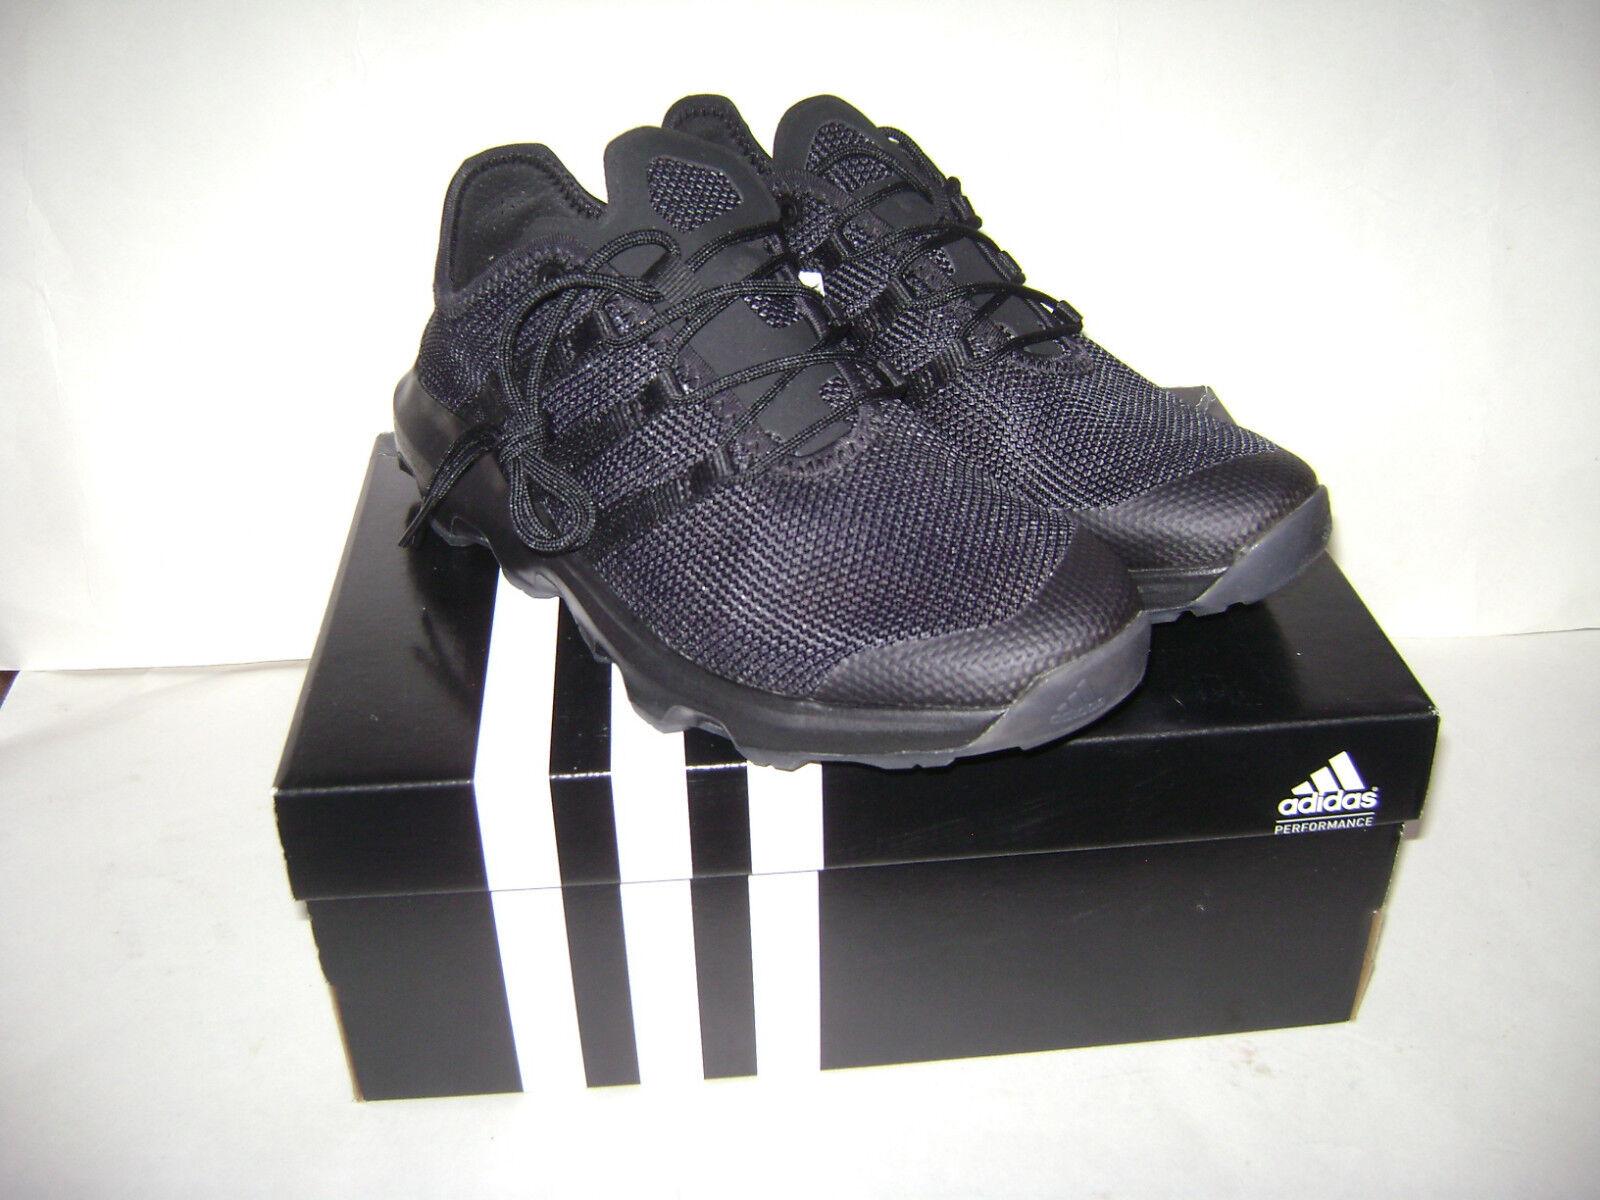 NIB Adidas Shoes Outdoor ClimaCool Voyager Hiking Shoes Adidas US Men Sz 8.5 Women 9.5 Black f8e385